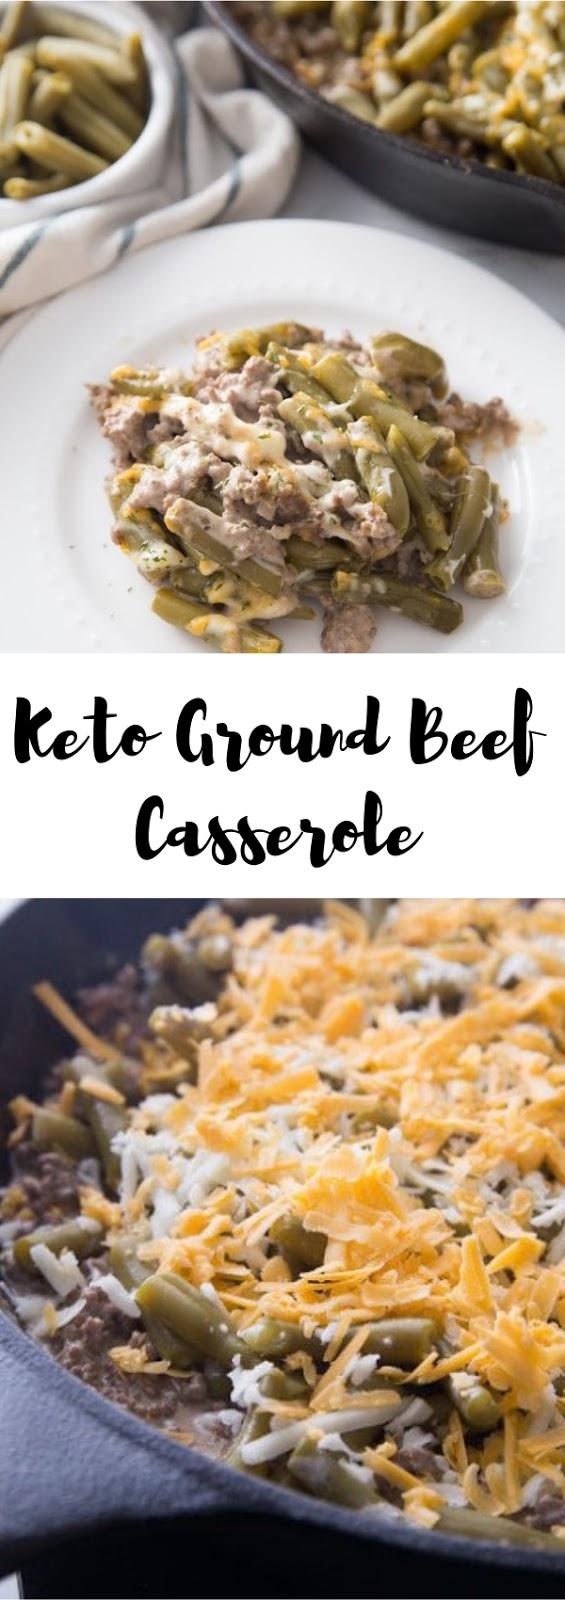 Keto Ground Beef Casserole #maincourse #dinner #keto #ground #beef #casserole